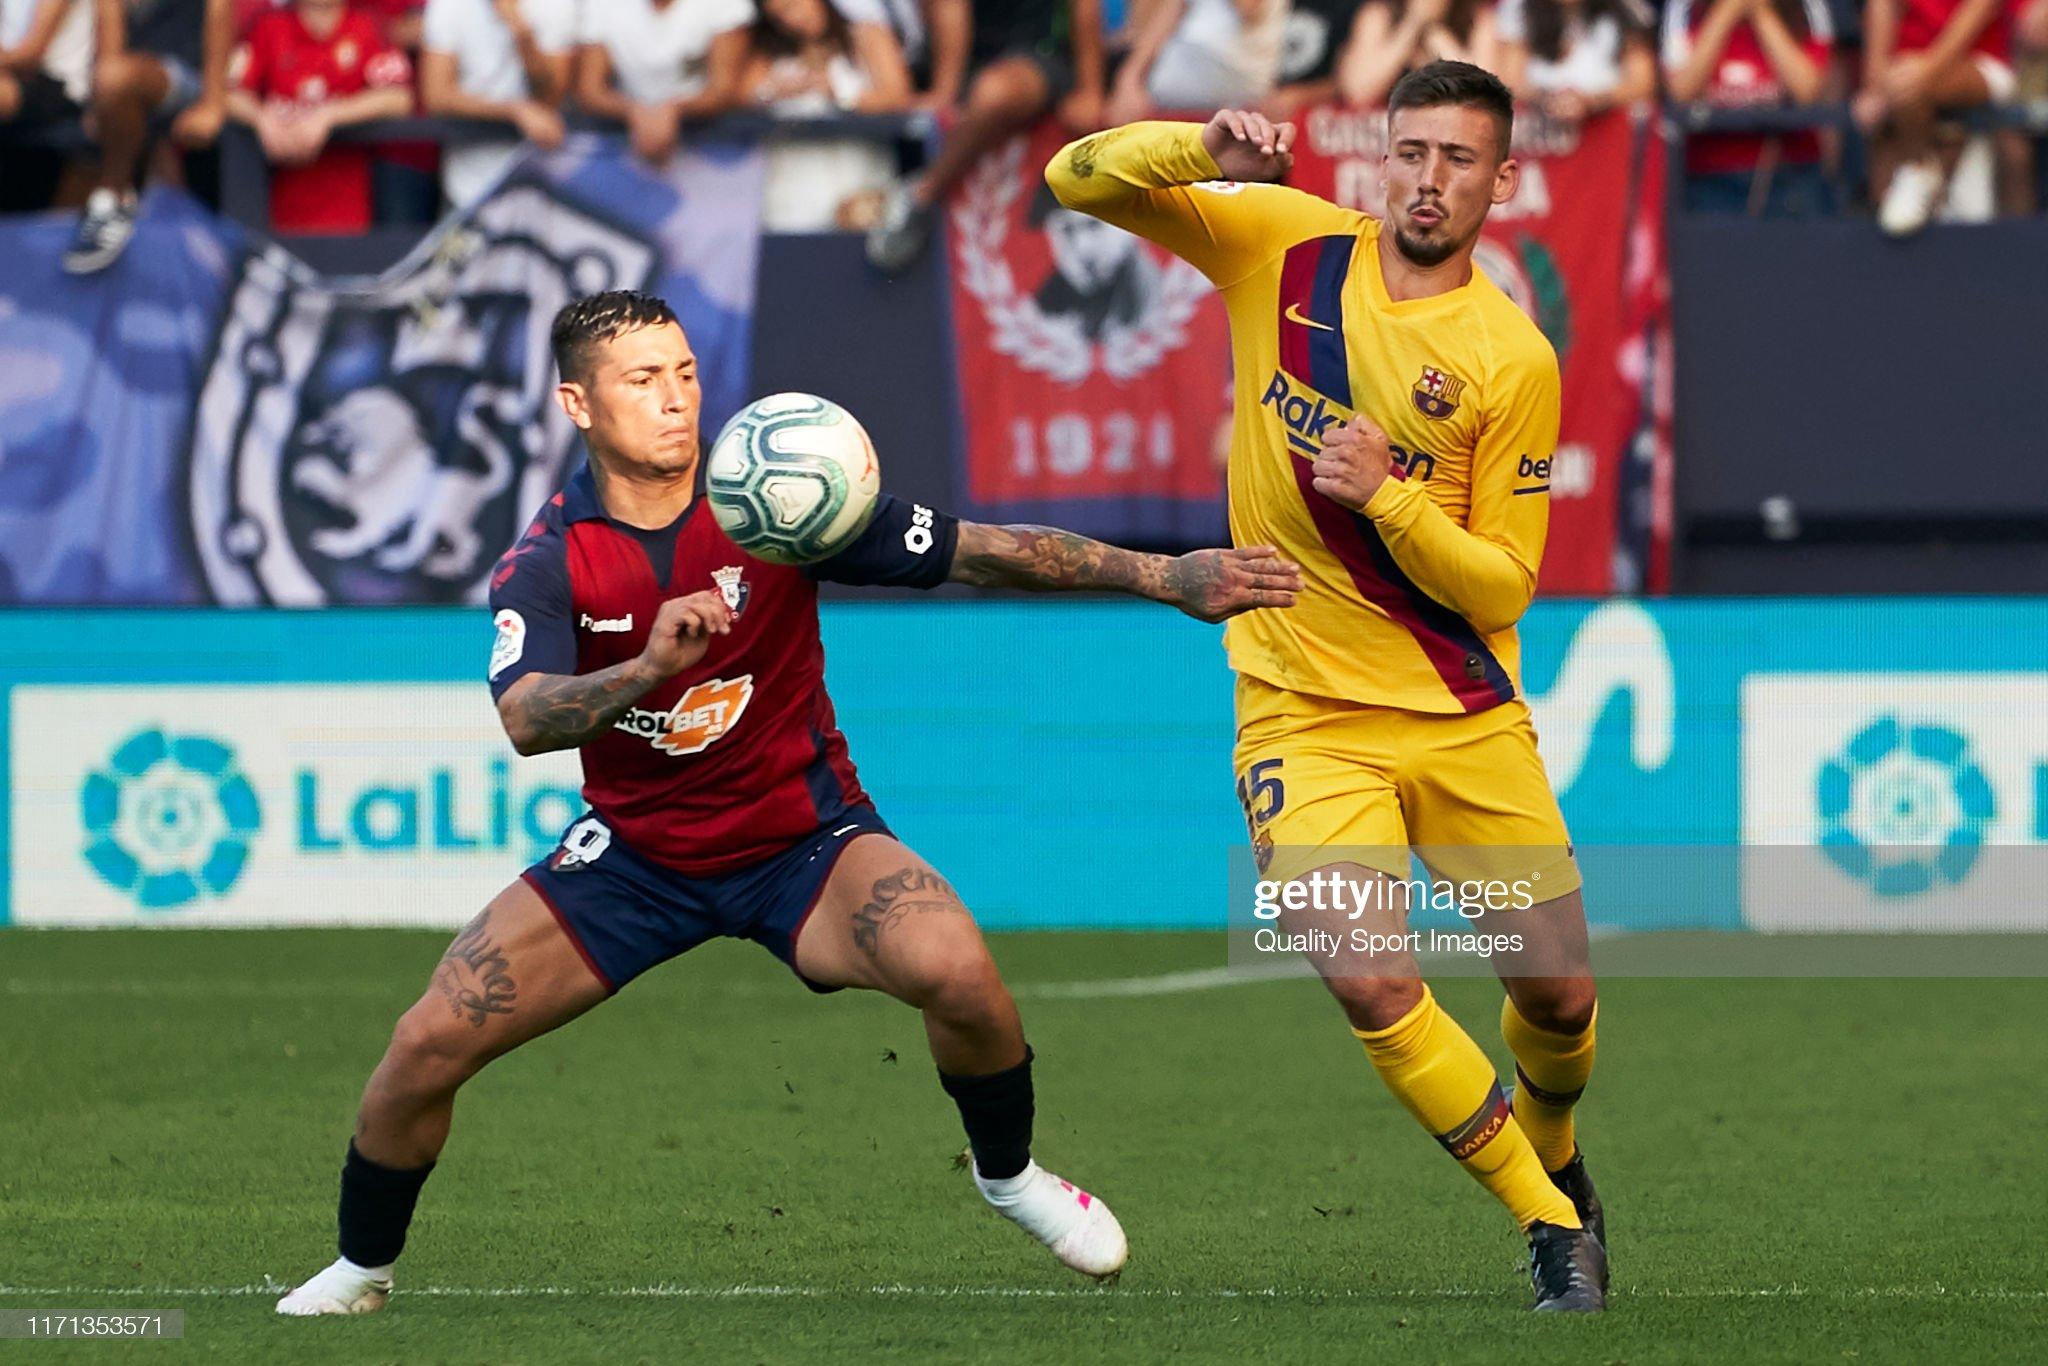 صور مباراة : أوساسونا - برشلونة 2-2 ( 31-08-2019 )  Ezequiel-avila-of-ca-osasuna-competes-for-the-ball-with-clement-of-picture-id1171353571?s=2048x2048